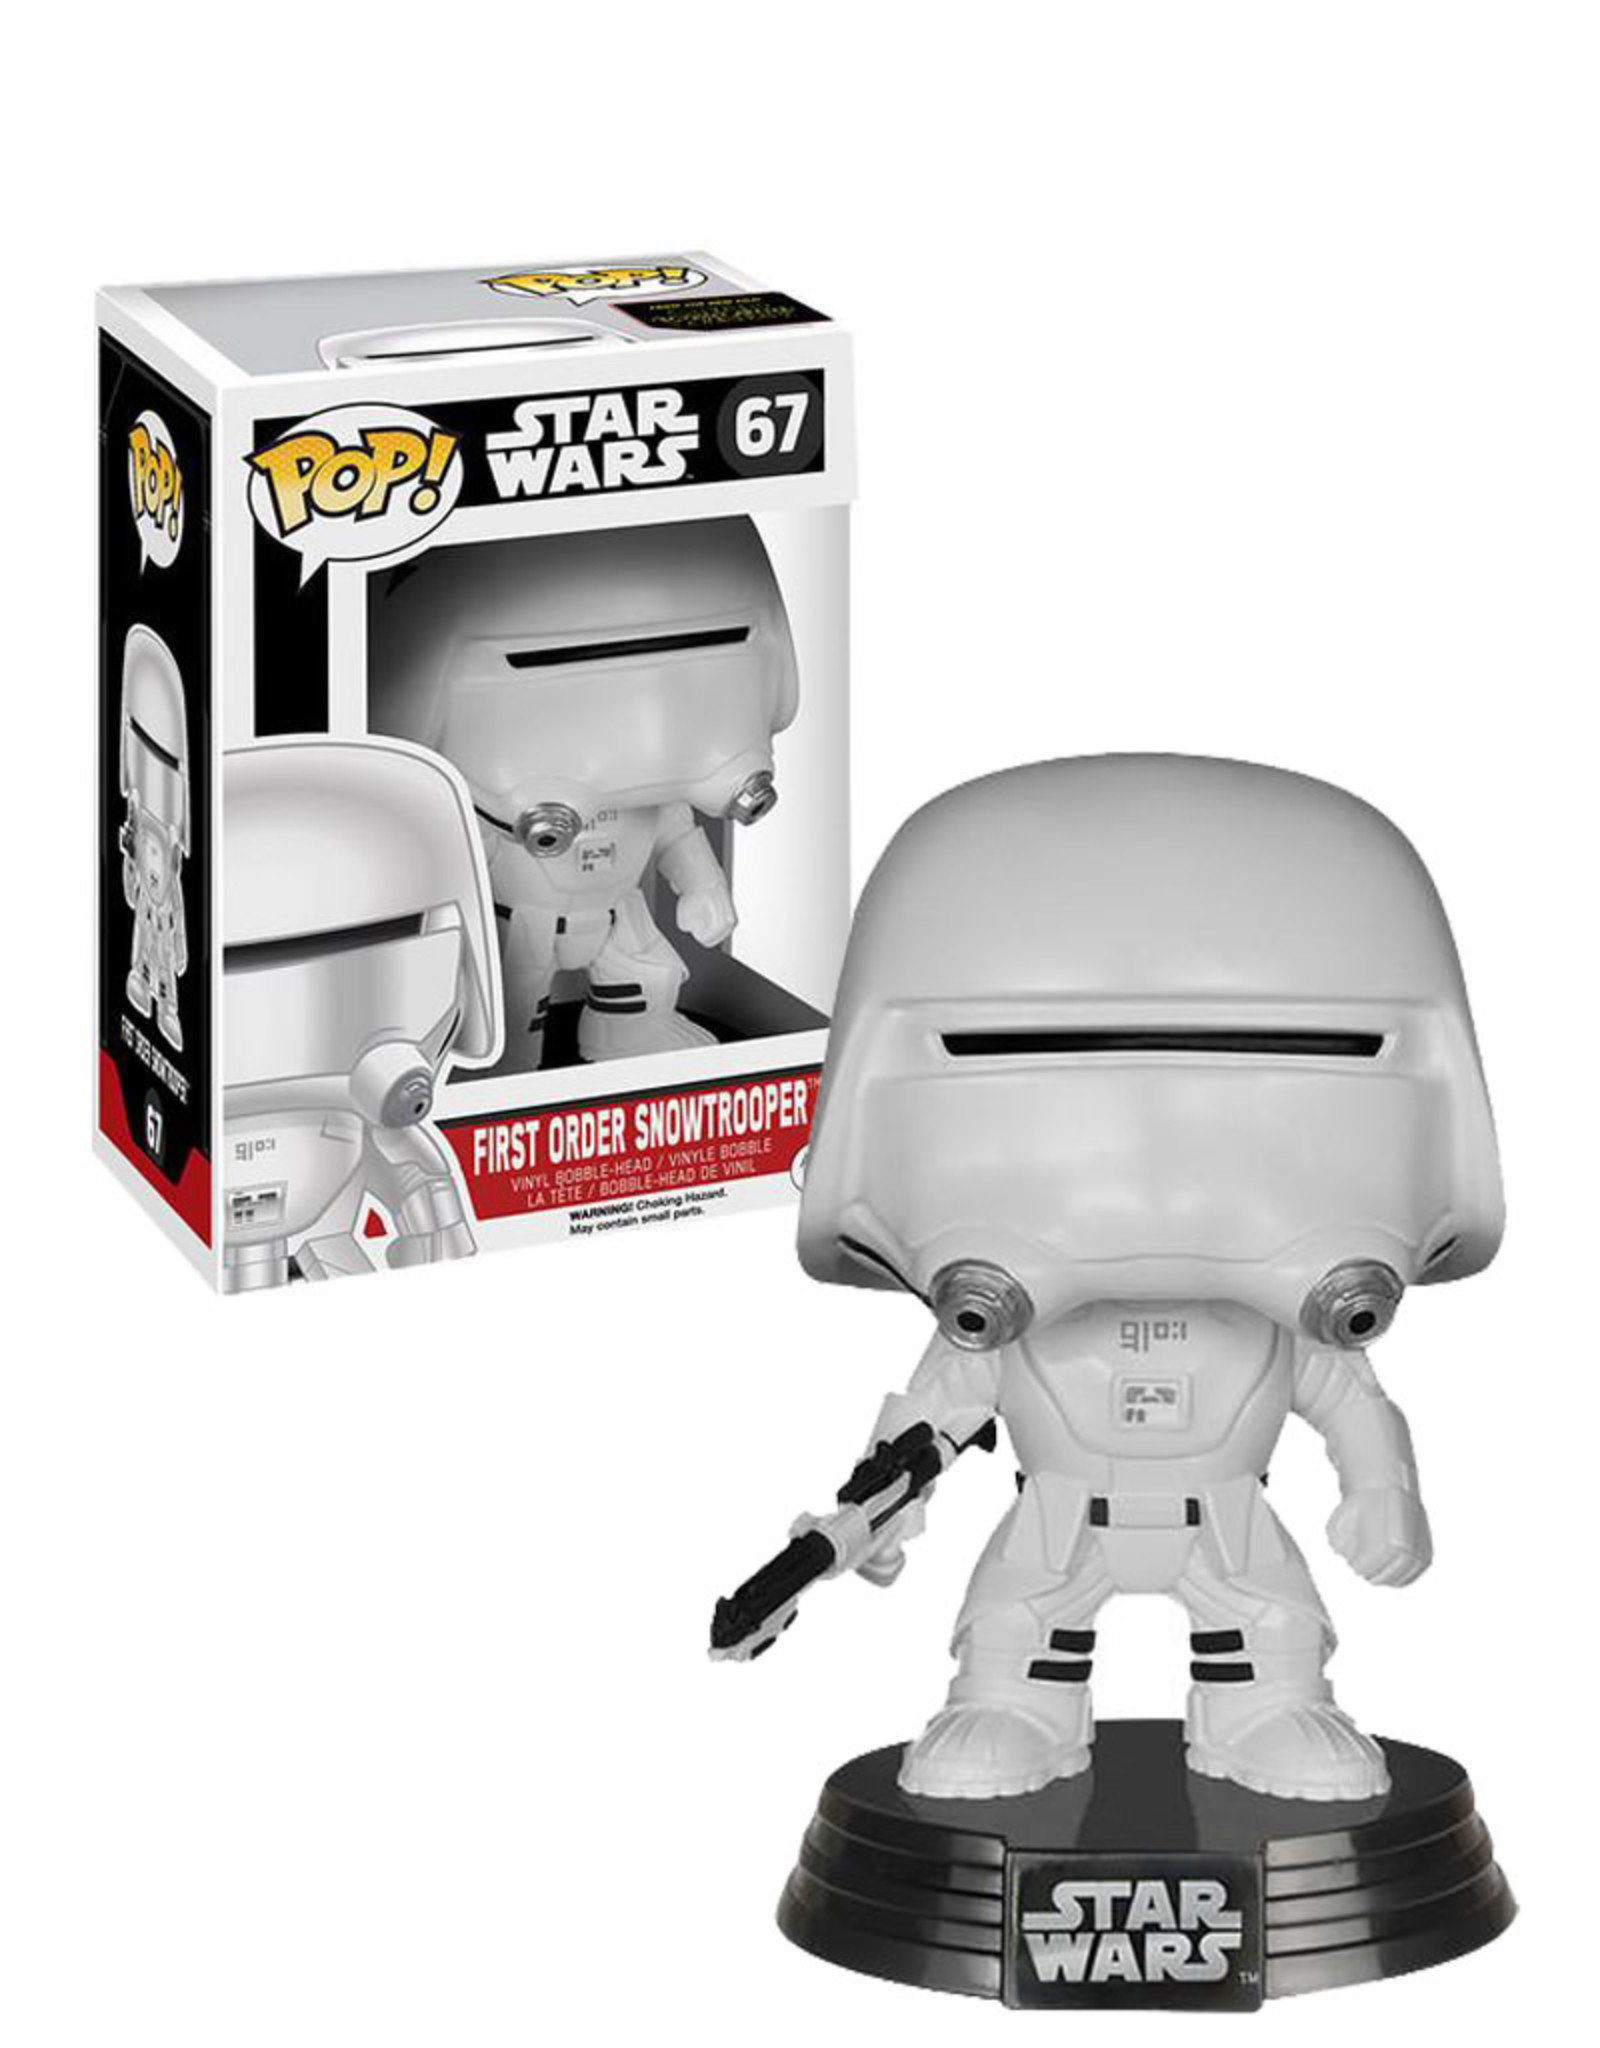 Star Wars Star Wars 67 ( Funko Pop ) First Order Snowtrooper